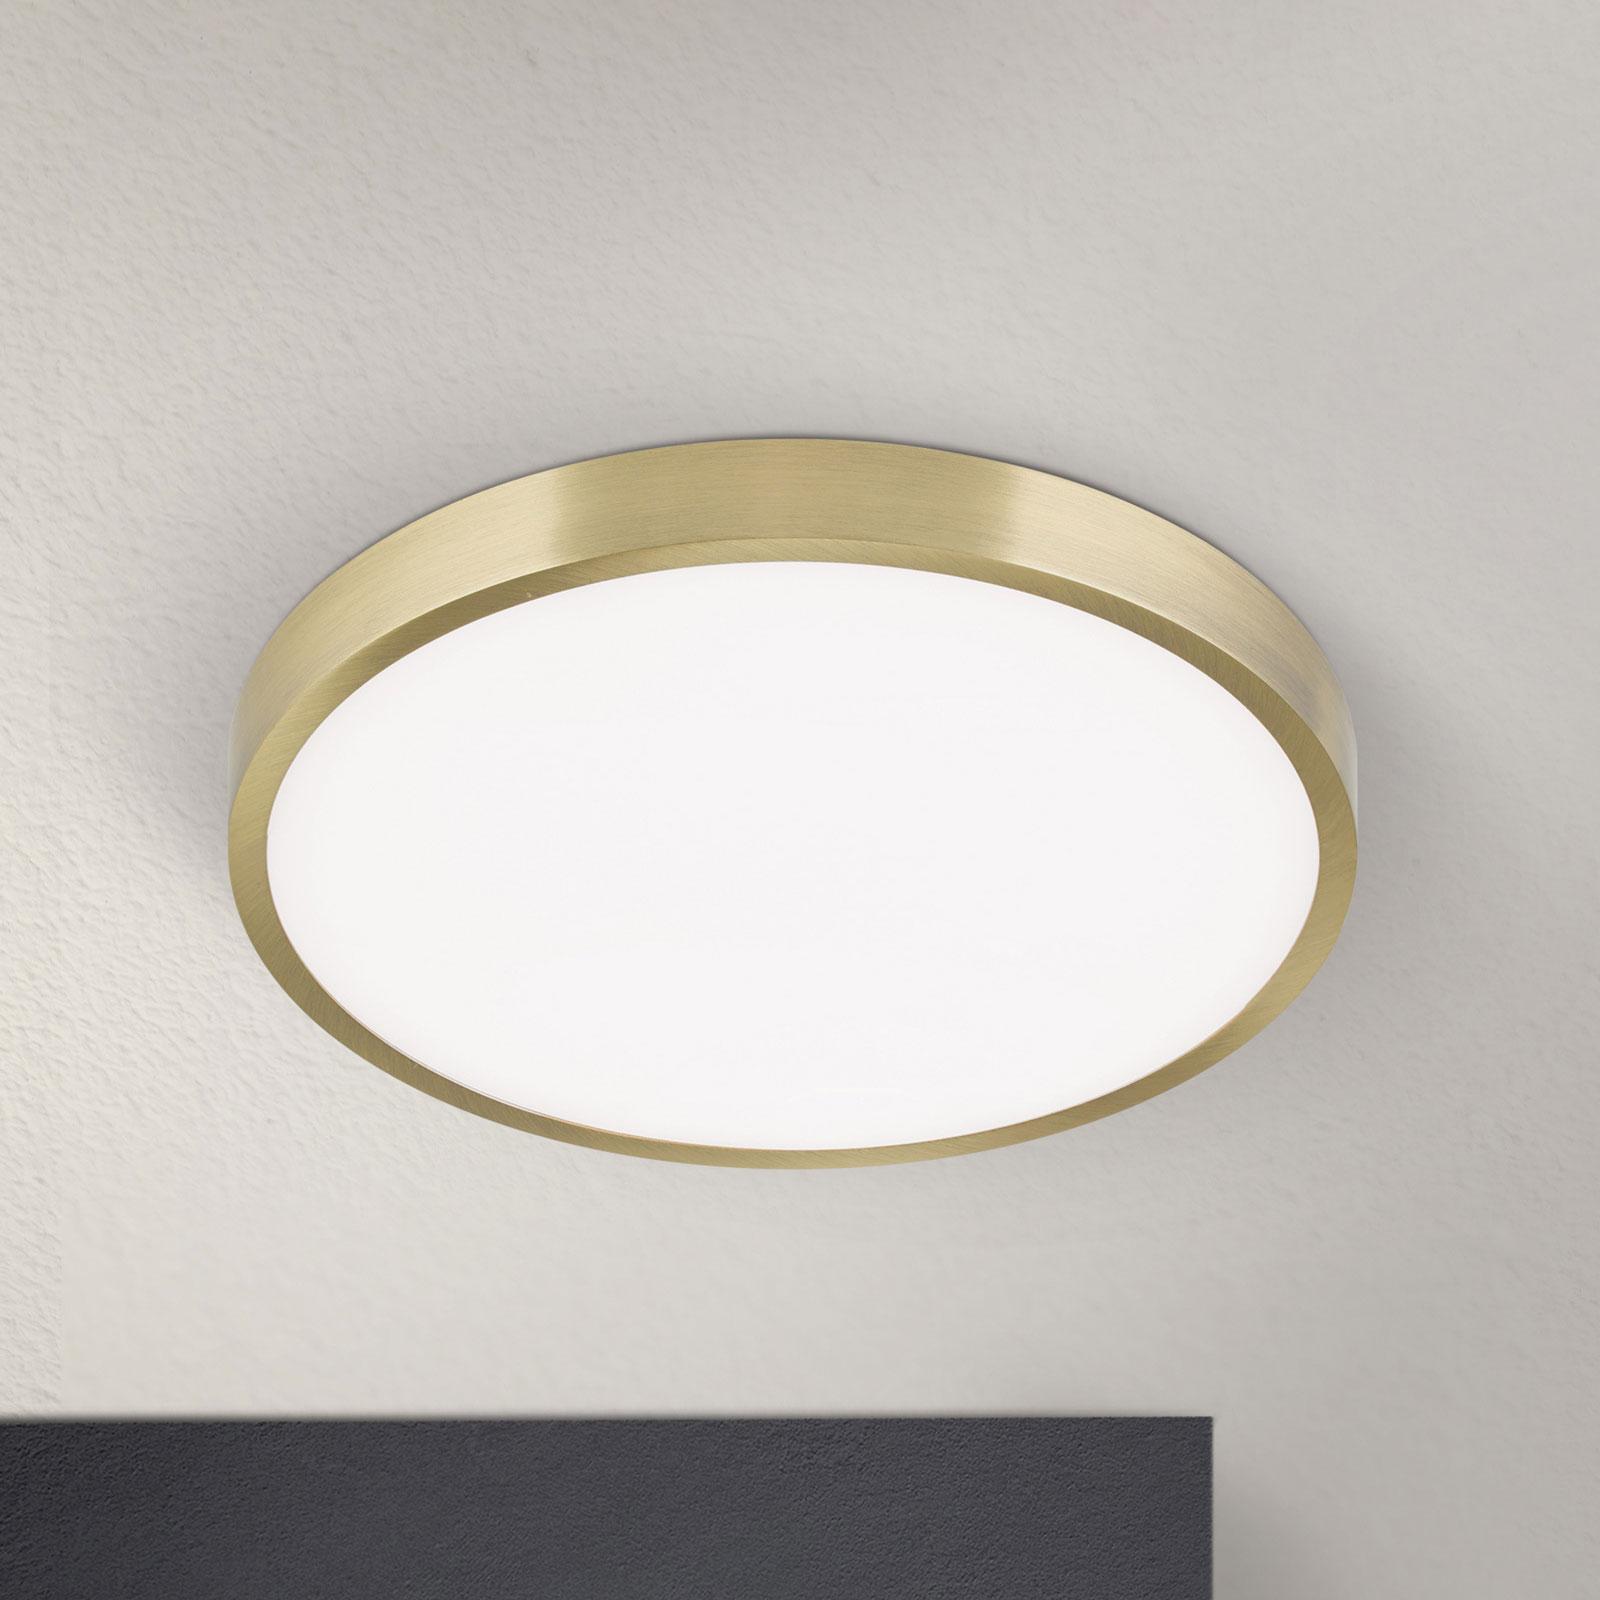 LED-kattovalaisin Bully, patinoitu, 24 cm